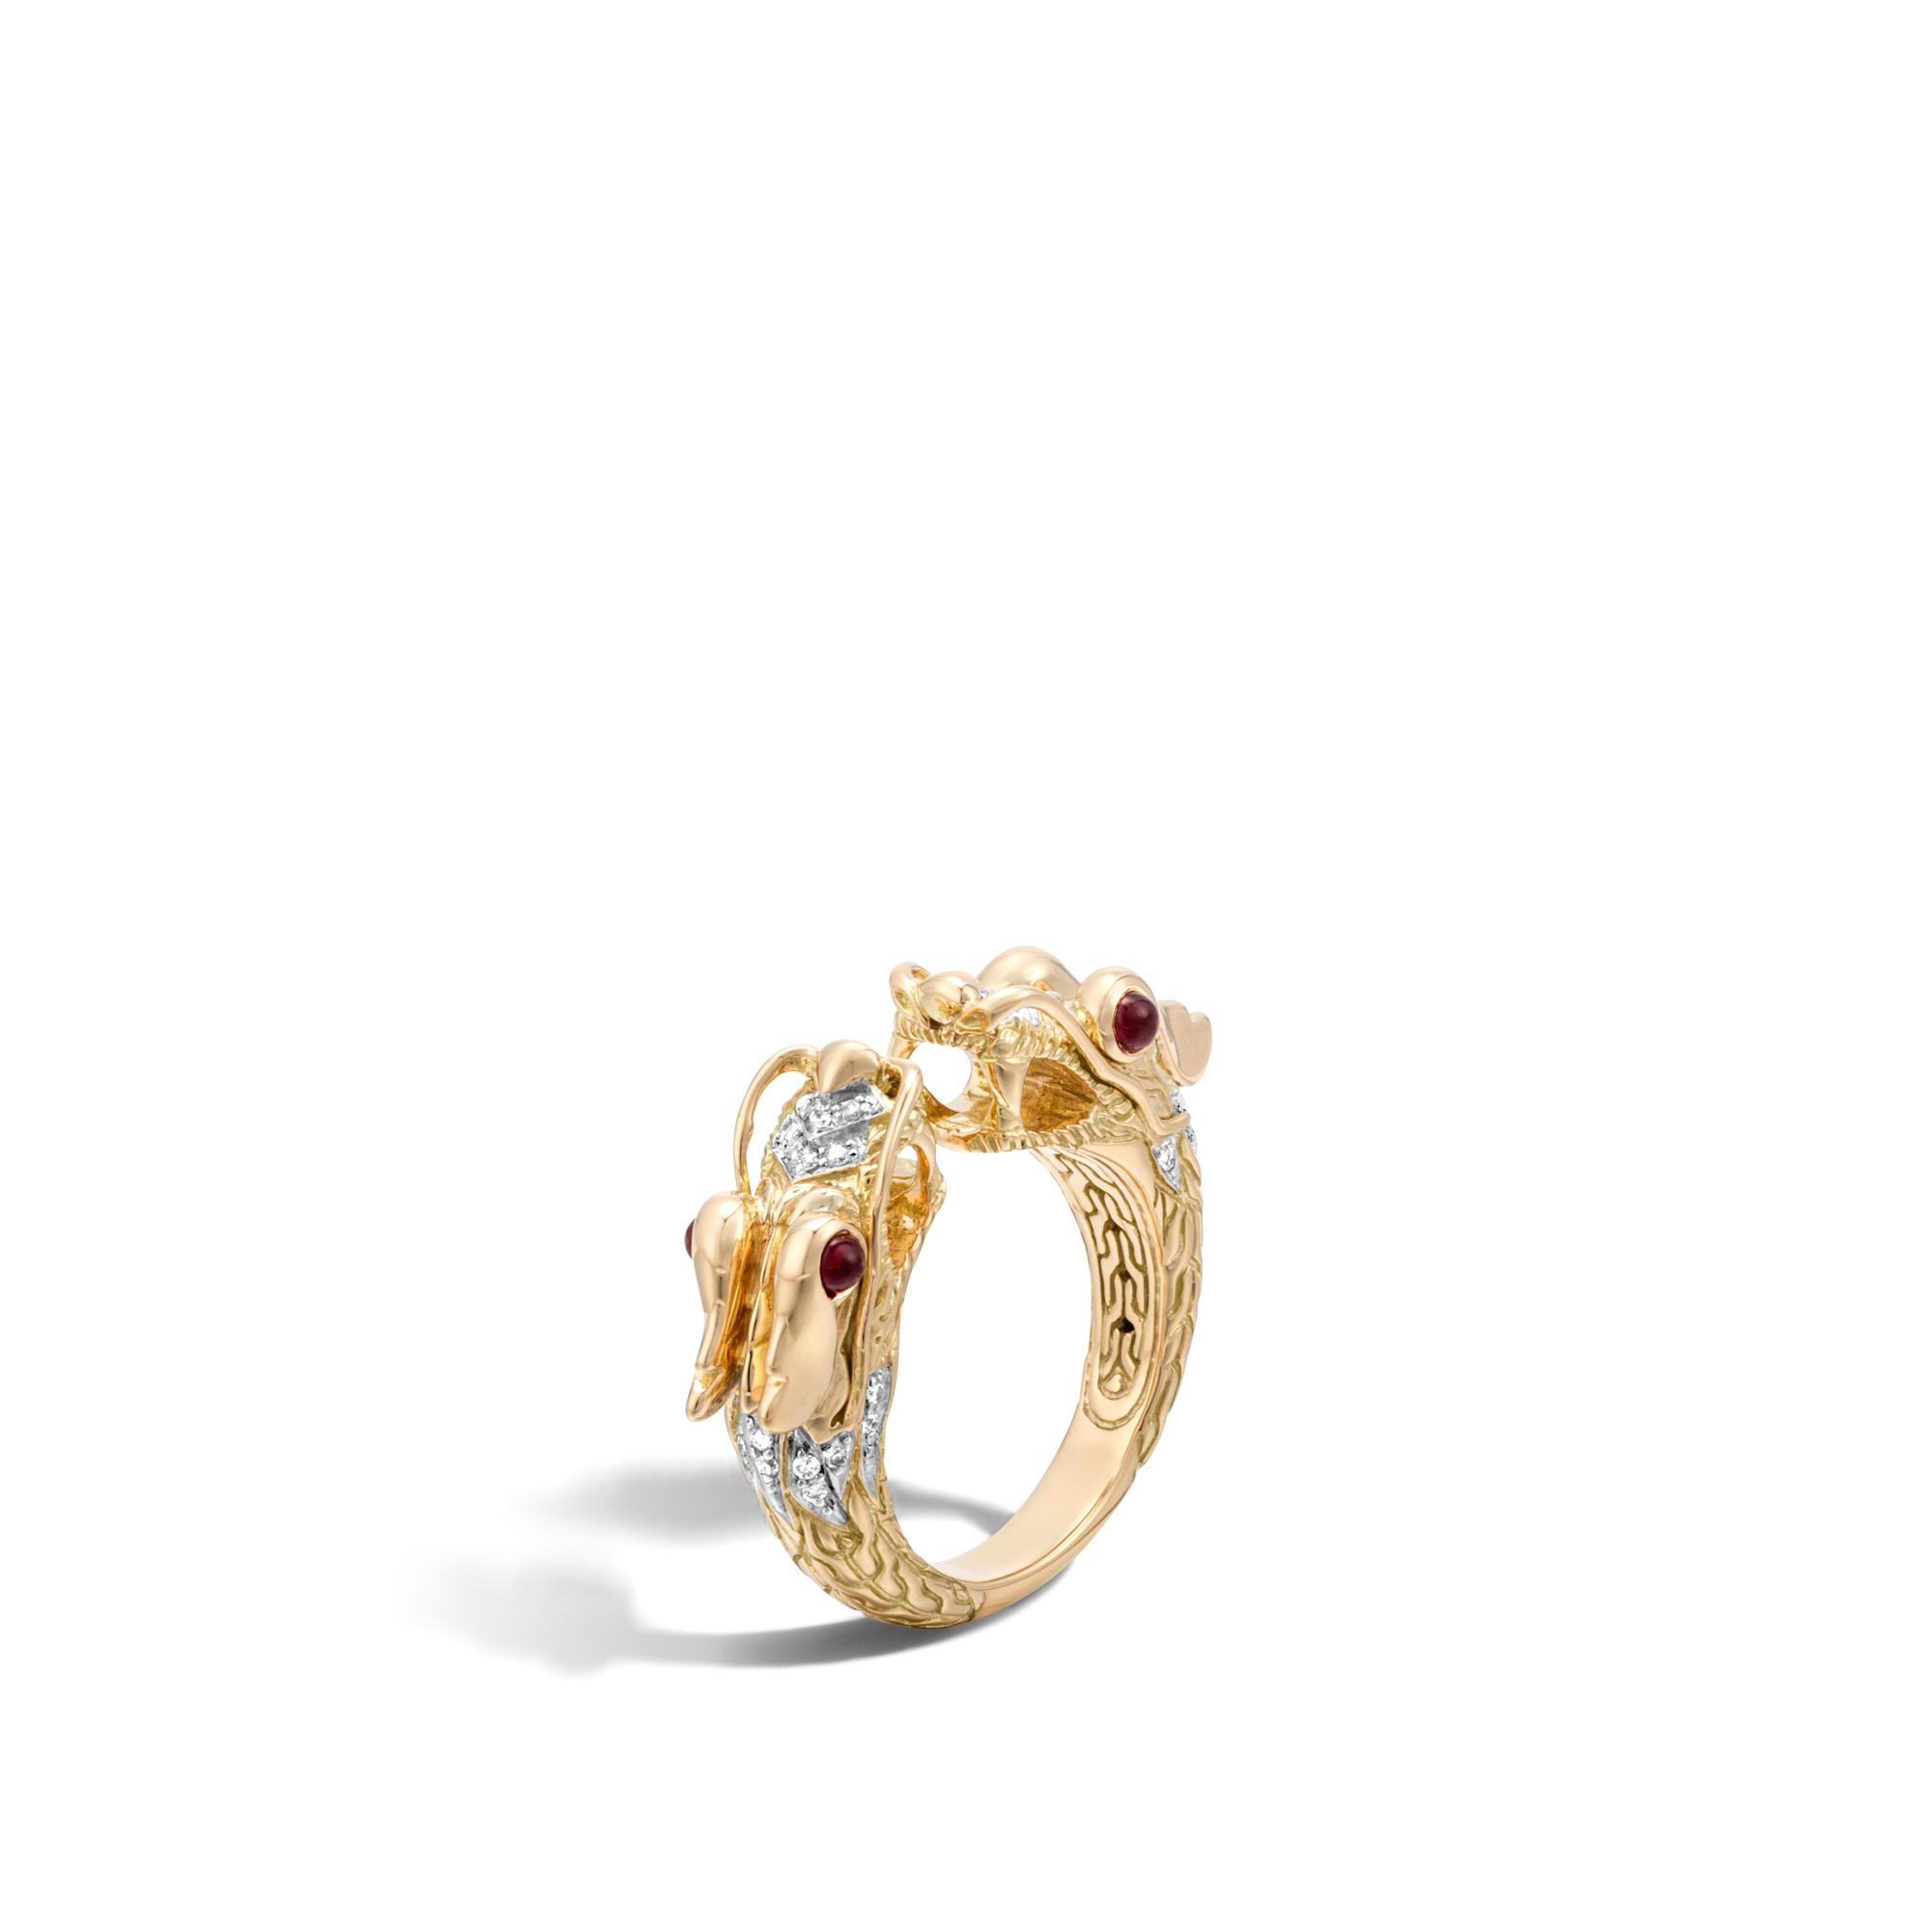 John Hardy Naga Ring With Diamonds i3EHmS7zIO